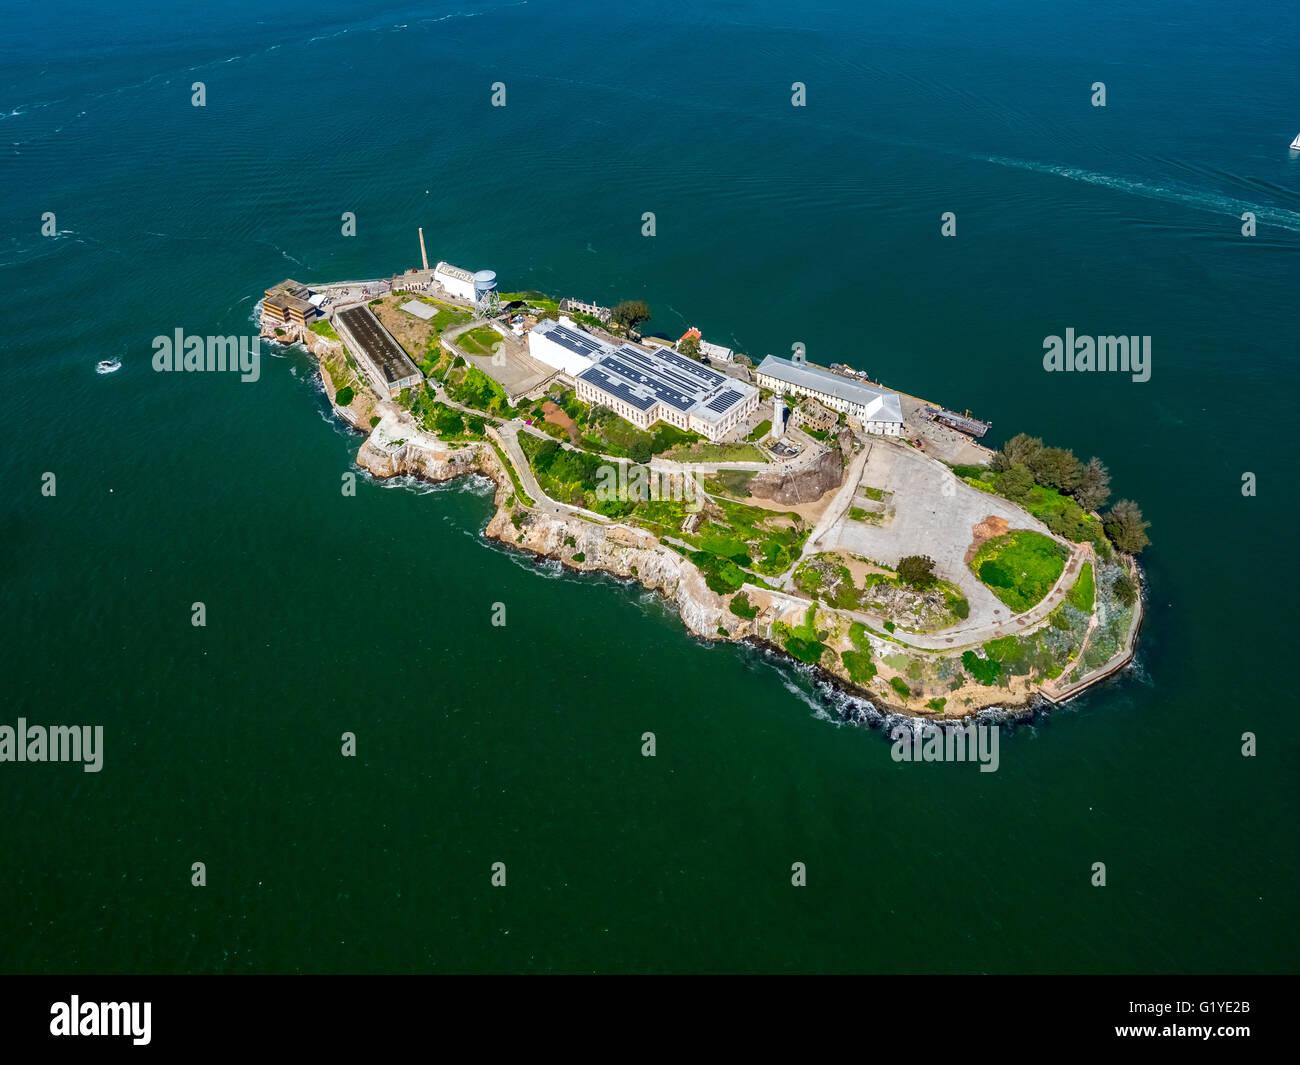 Prison Island Alcatraz, Alcatraz Island, Aerial view, San Francisco, San Francisco Bay Area, California, USA - Stock Image